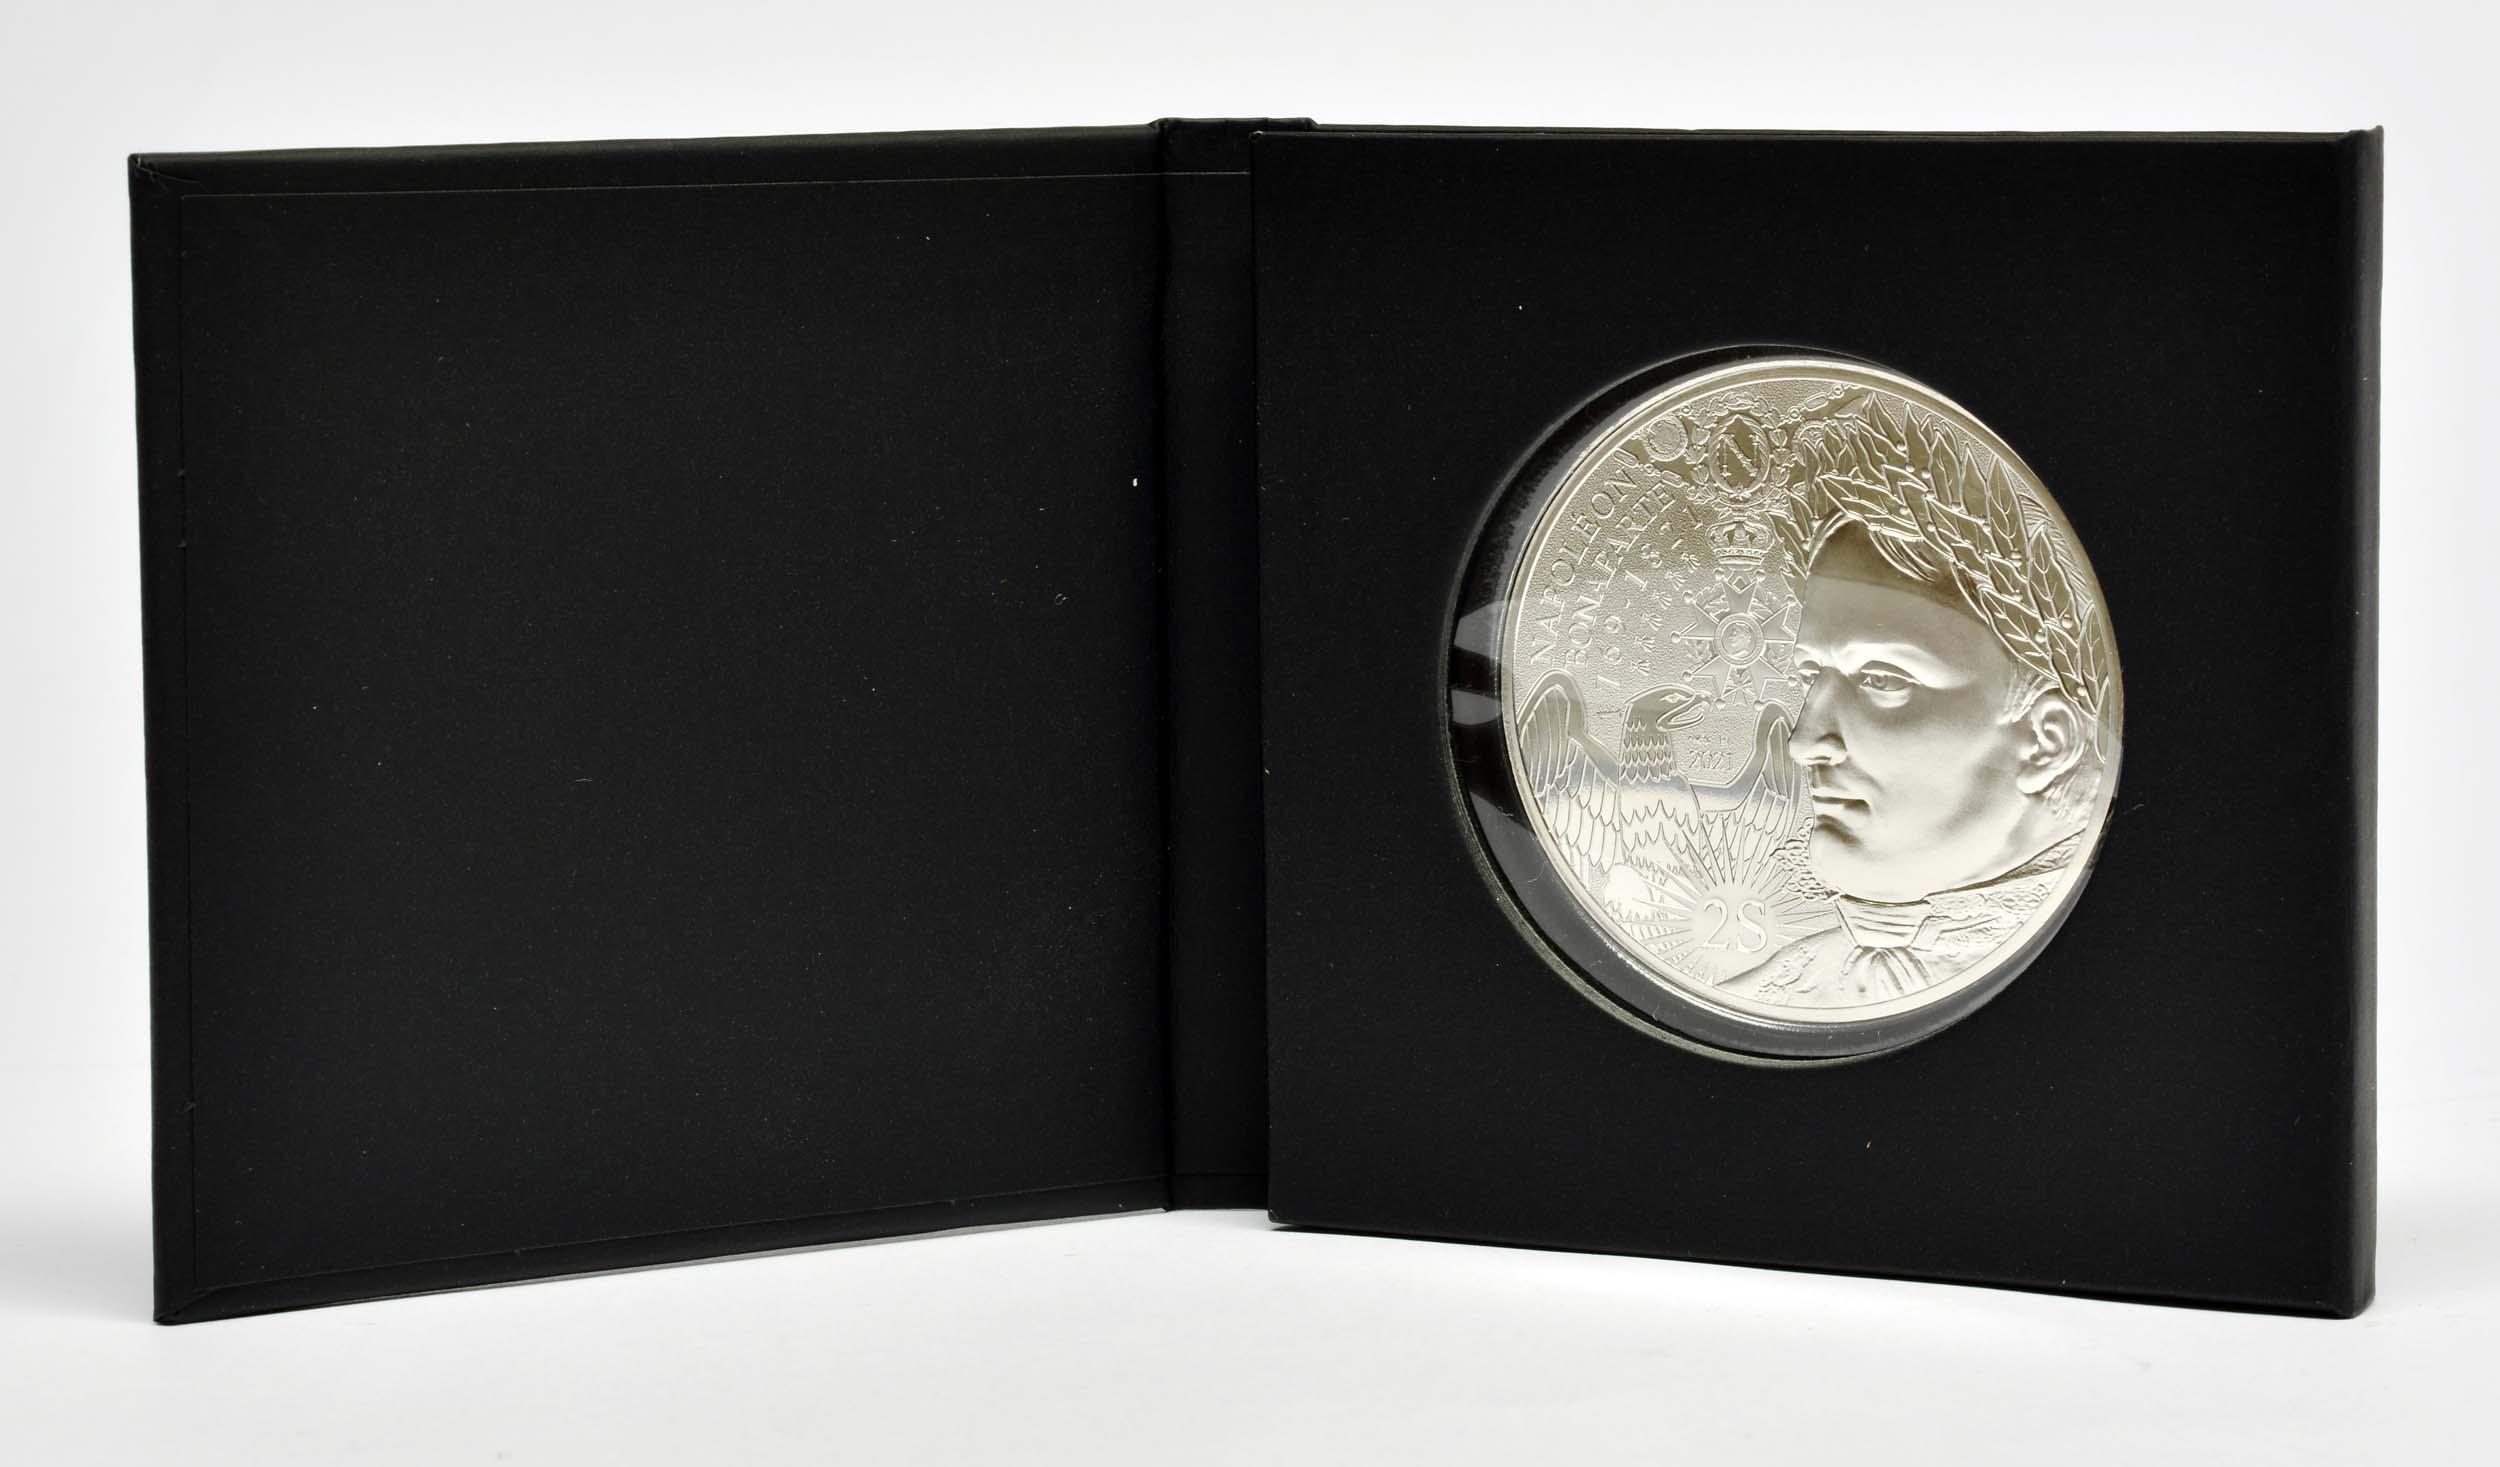 Lieferumfang:Frankreich : 100 Euro Napoleon  2021 Stgl.